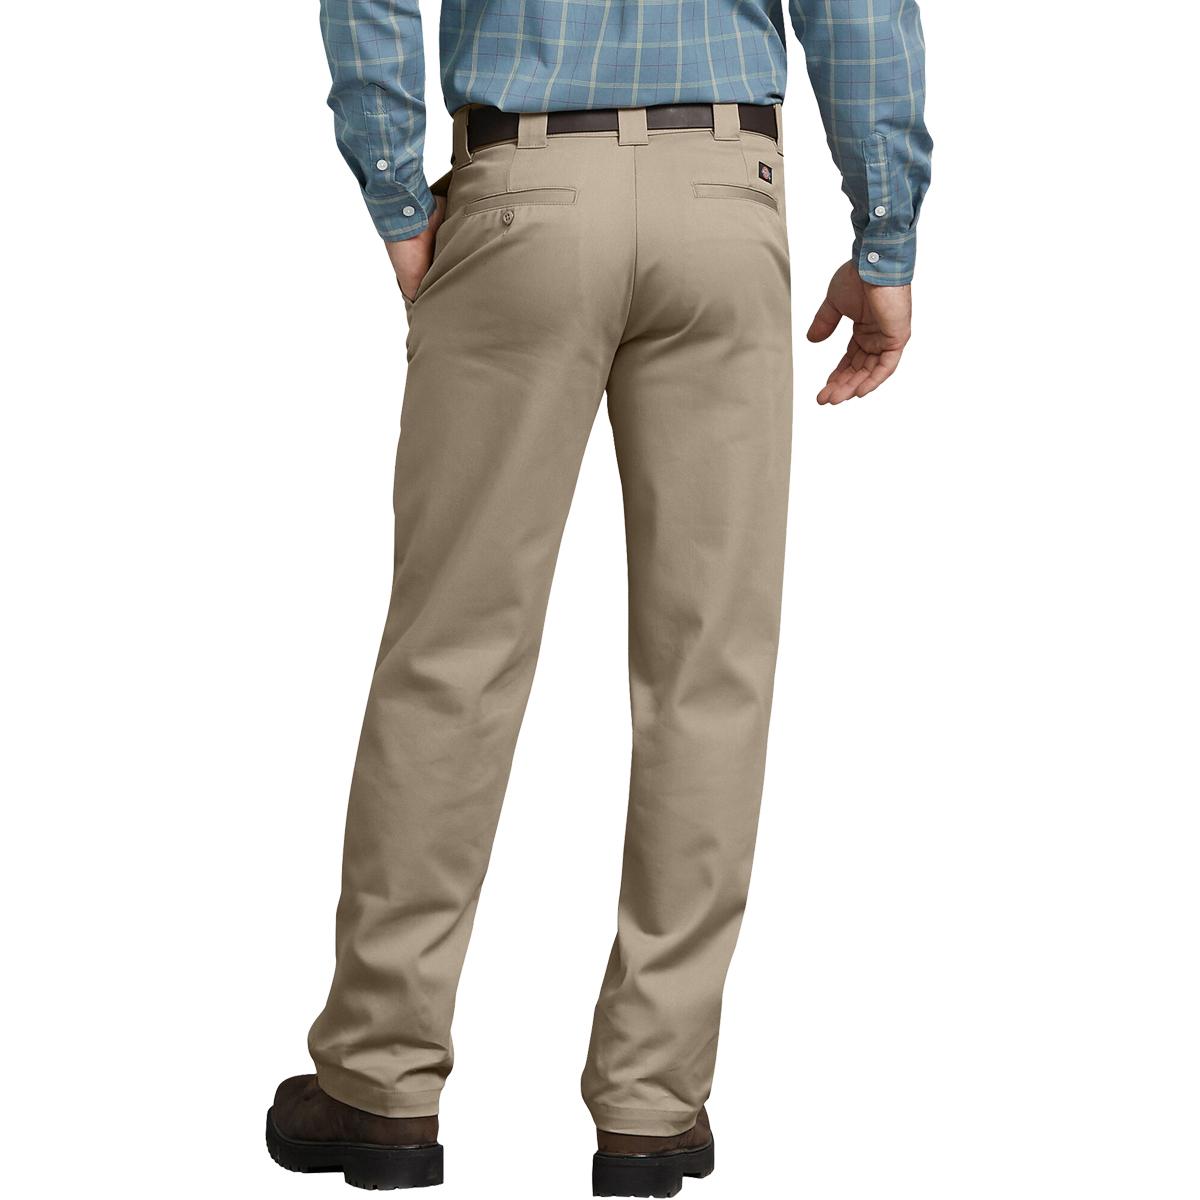 thumbnail 5 - Dickies FLEX Tough Max Regular Fit Straight Leg Twill Work Pants Desert Khaki